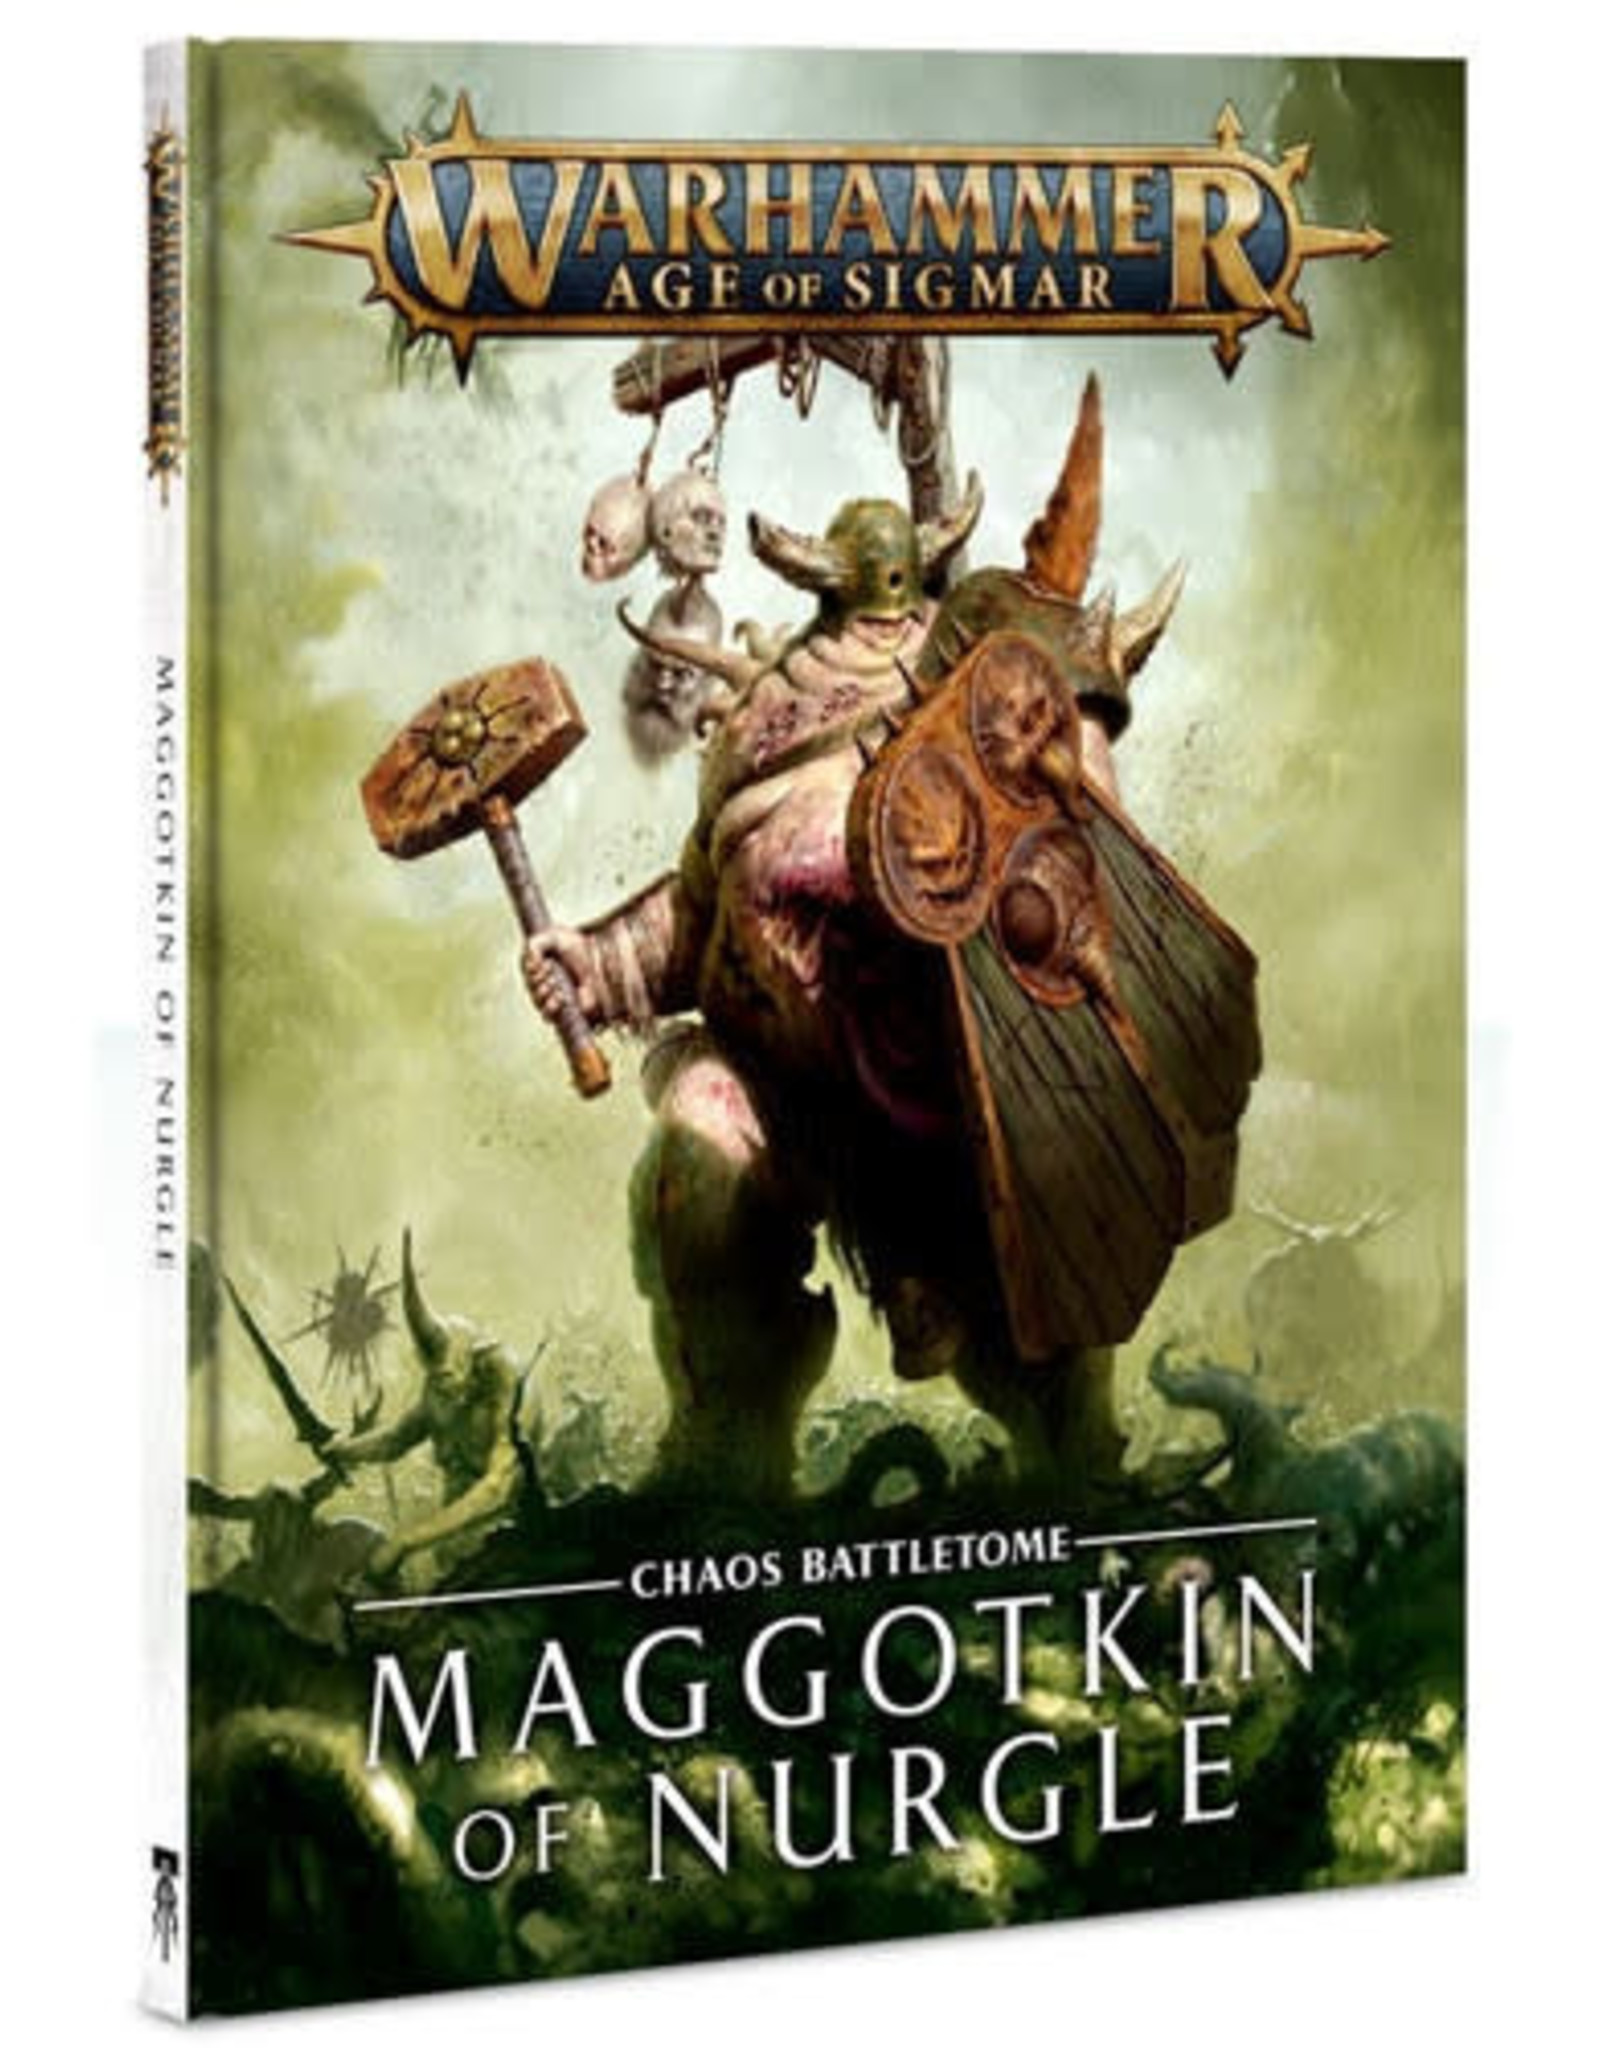 Age of Sigmar Battletome: Maggotkin Of Nurgle